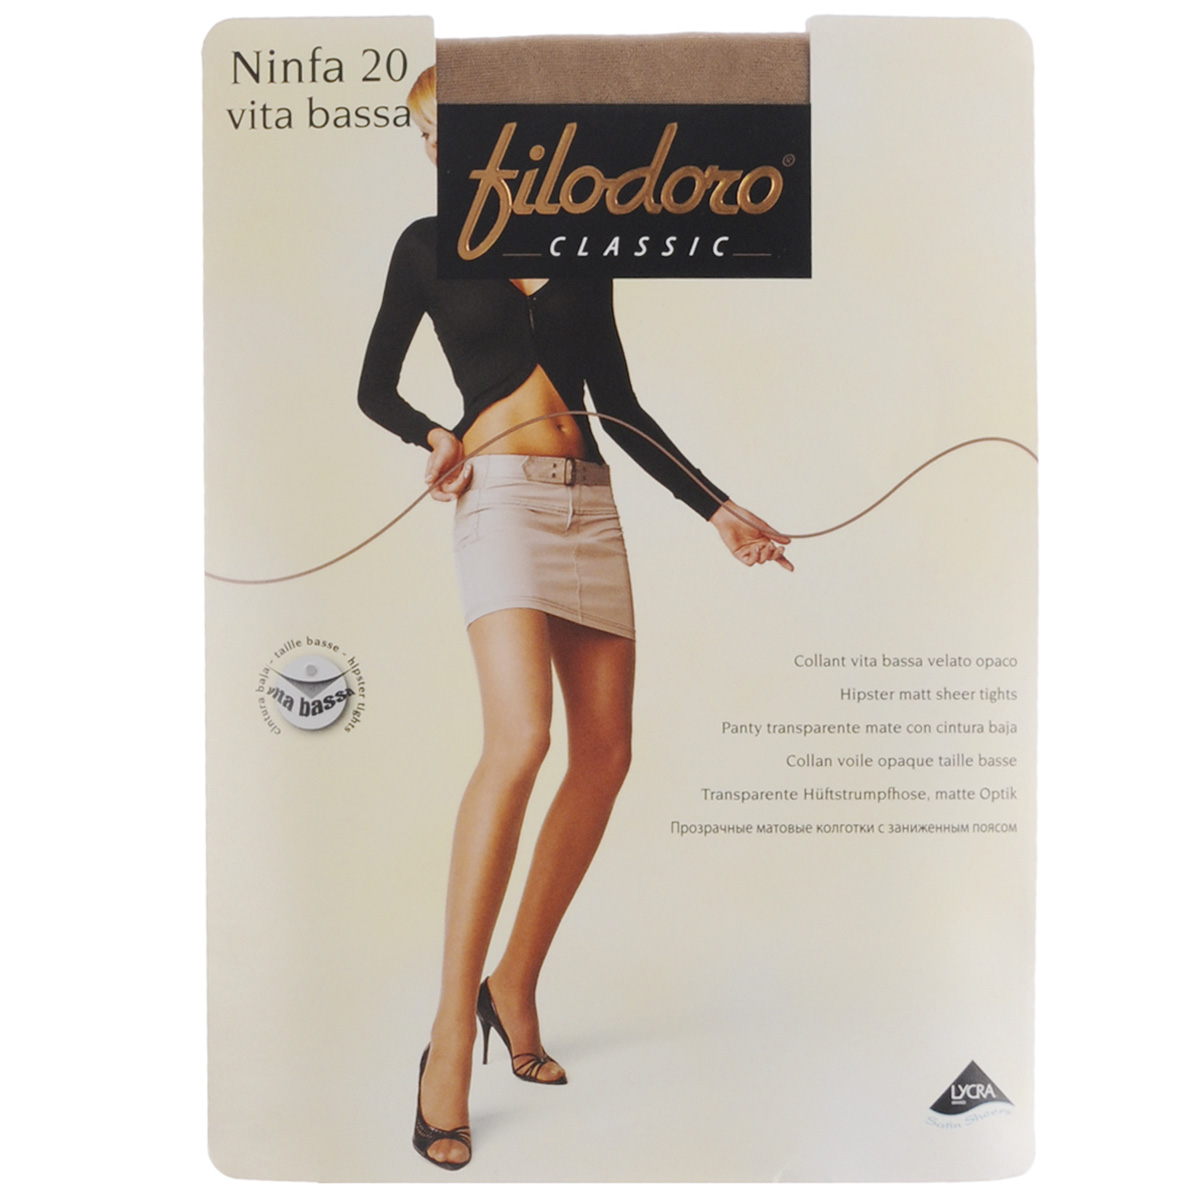 Колготки женские Filodoro Classic Ninfa 20 Vita Bassa, цвет: Tea (легкий загар). C112822FC. Размер 2 (S) колготки omsa nudo vita bassa размер 4 плотность 20 den nero